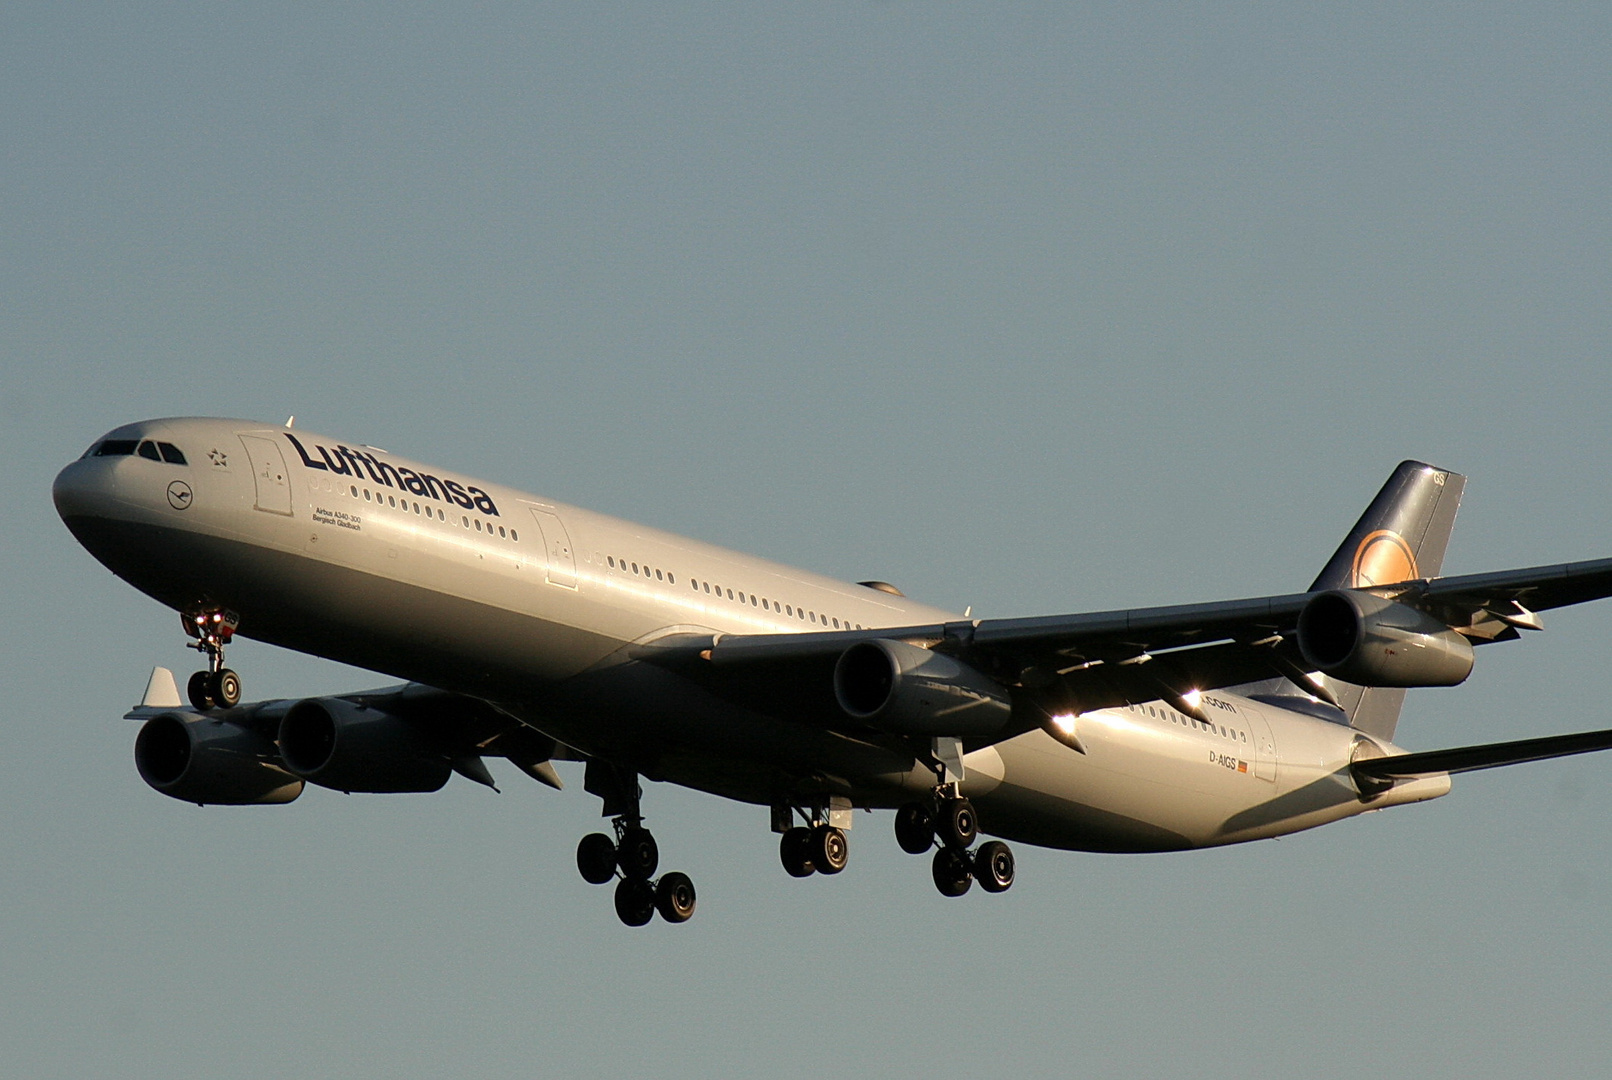 A340-300 D-AIGS